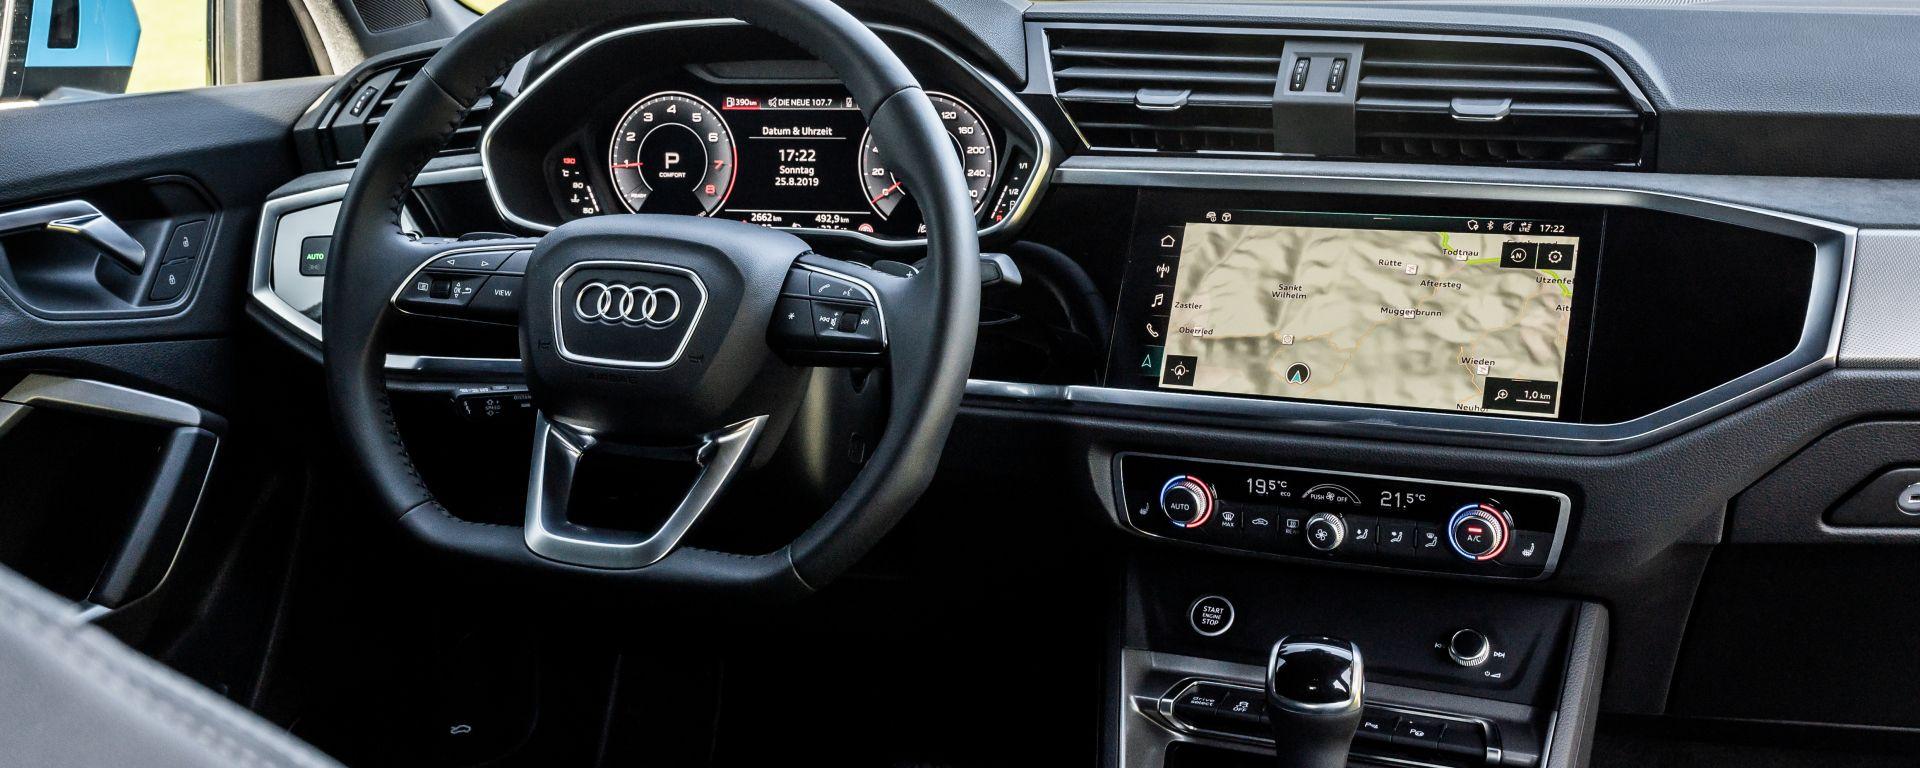 Audi Q3 Sportback, l'infotainment